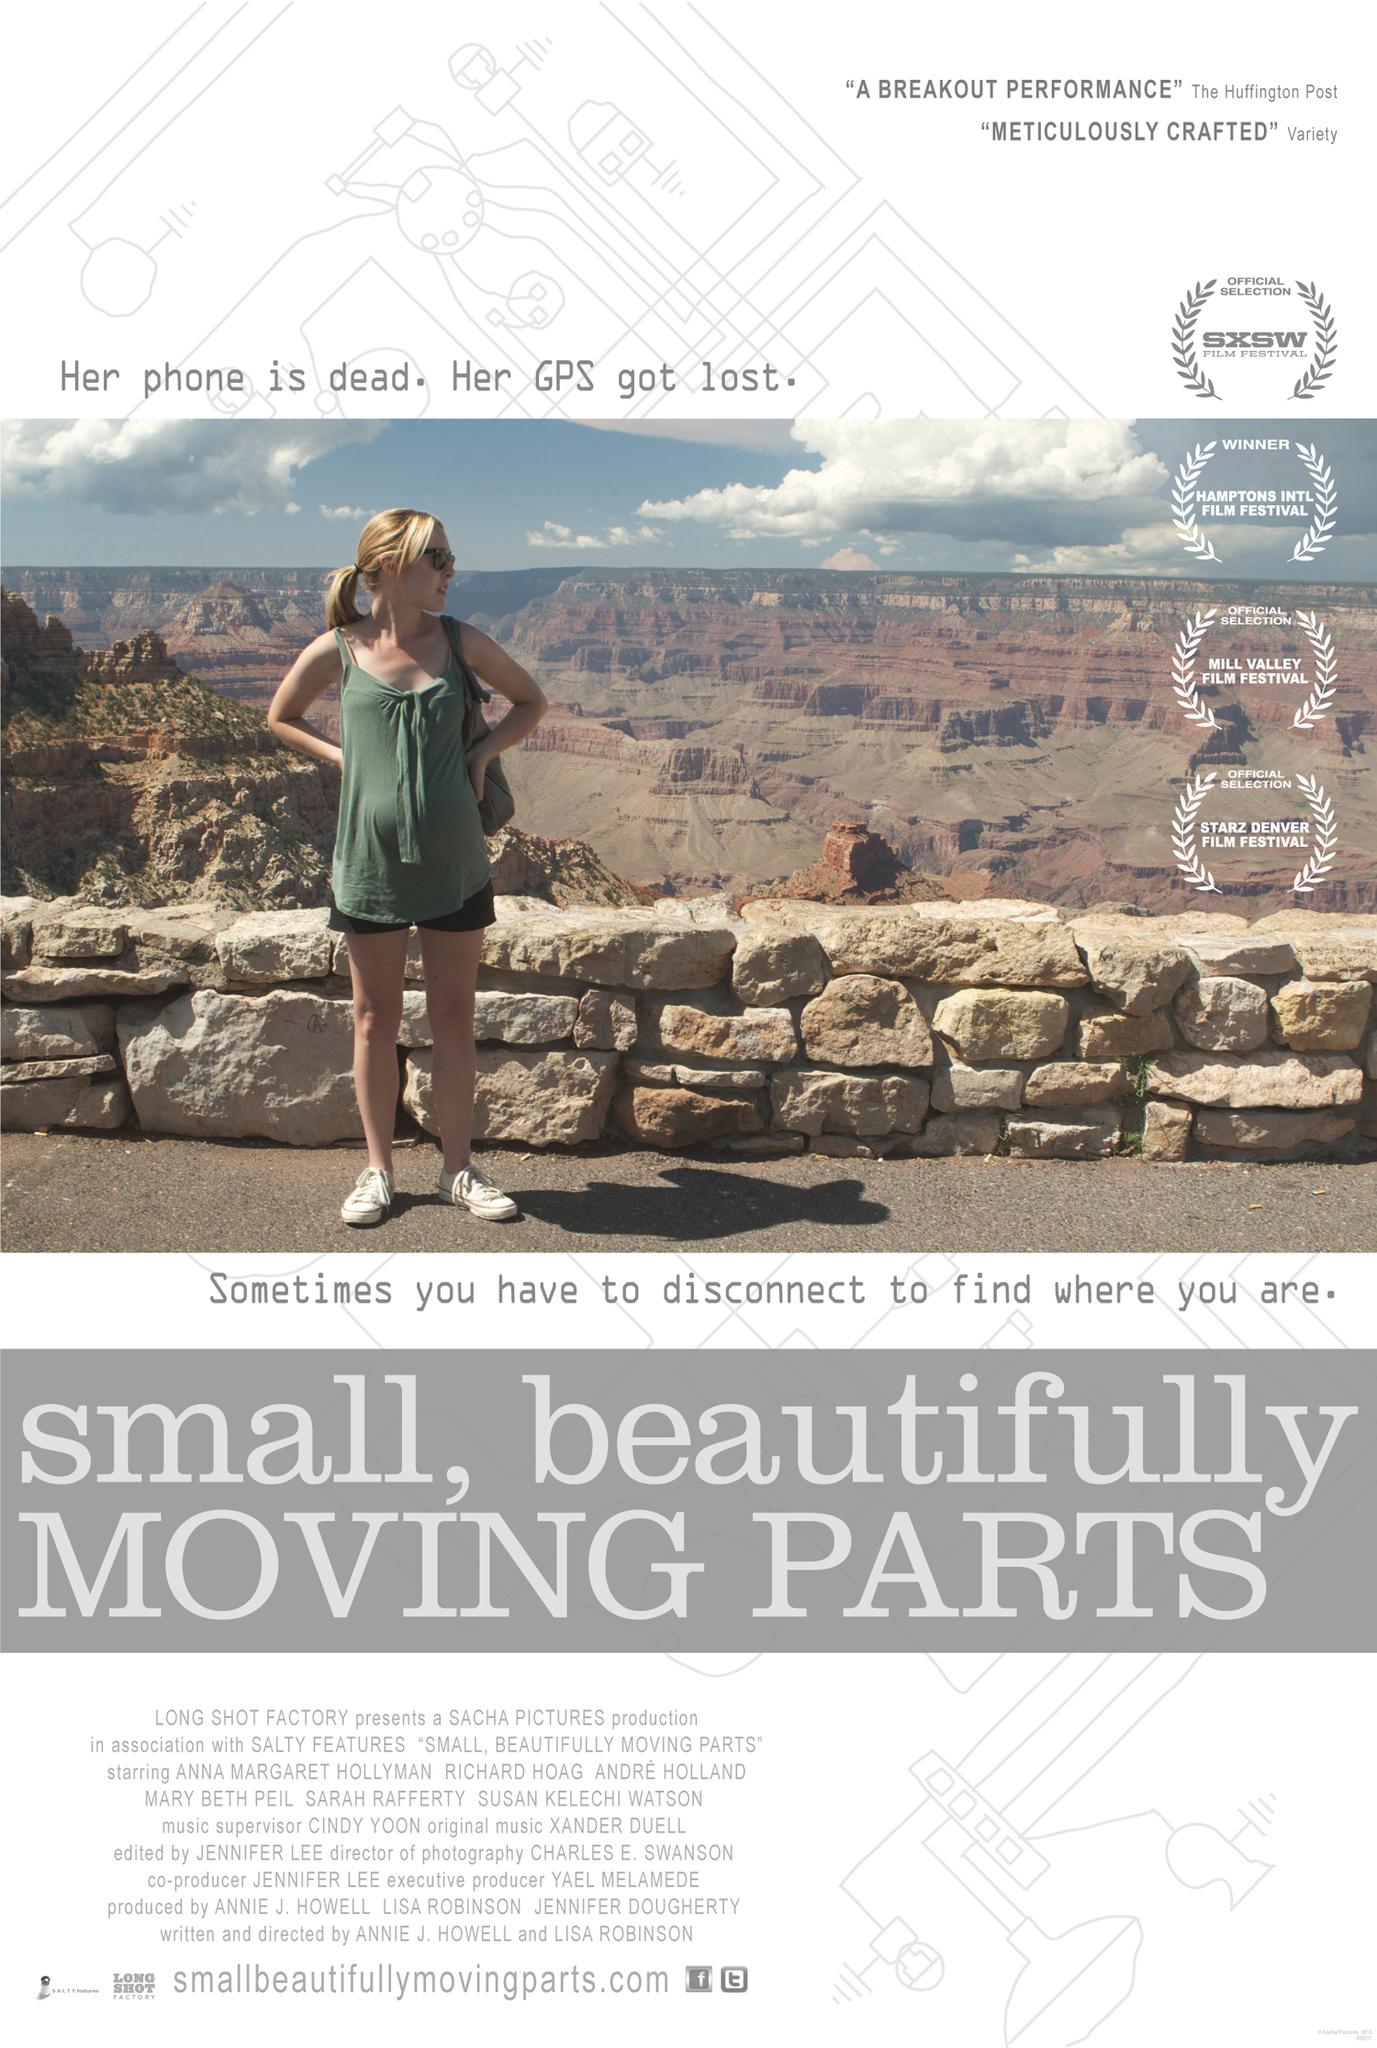 Small, Beautifully Moving Parts (2011)